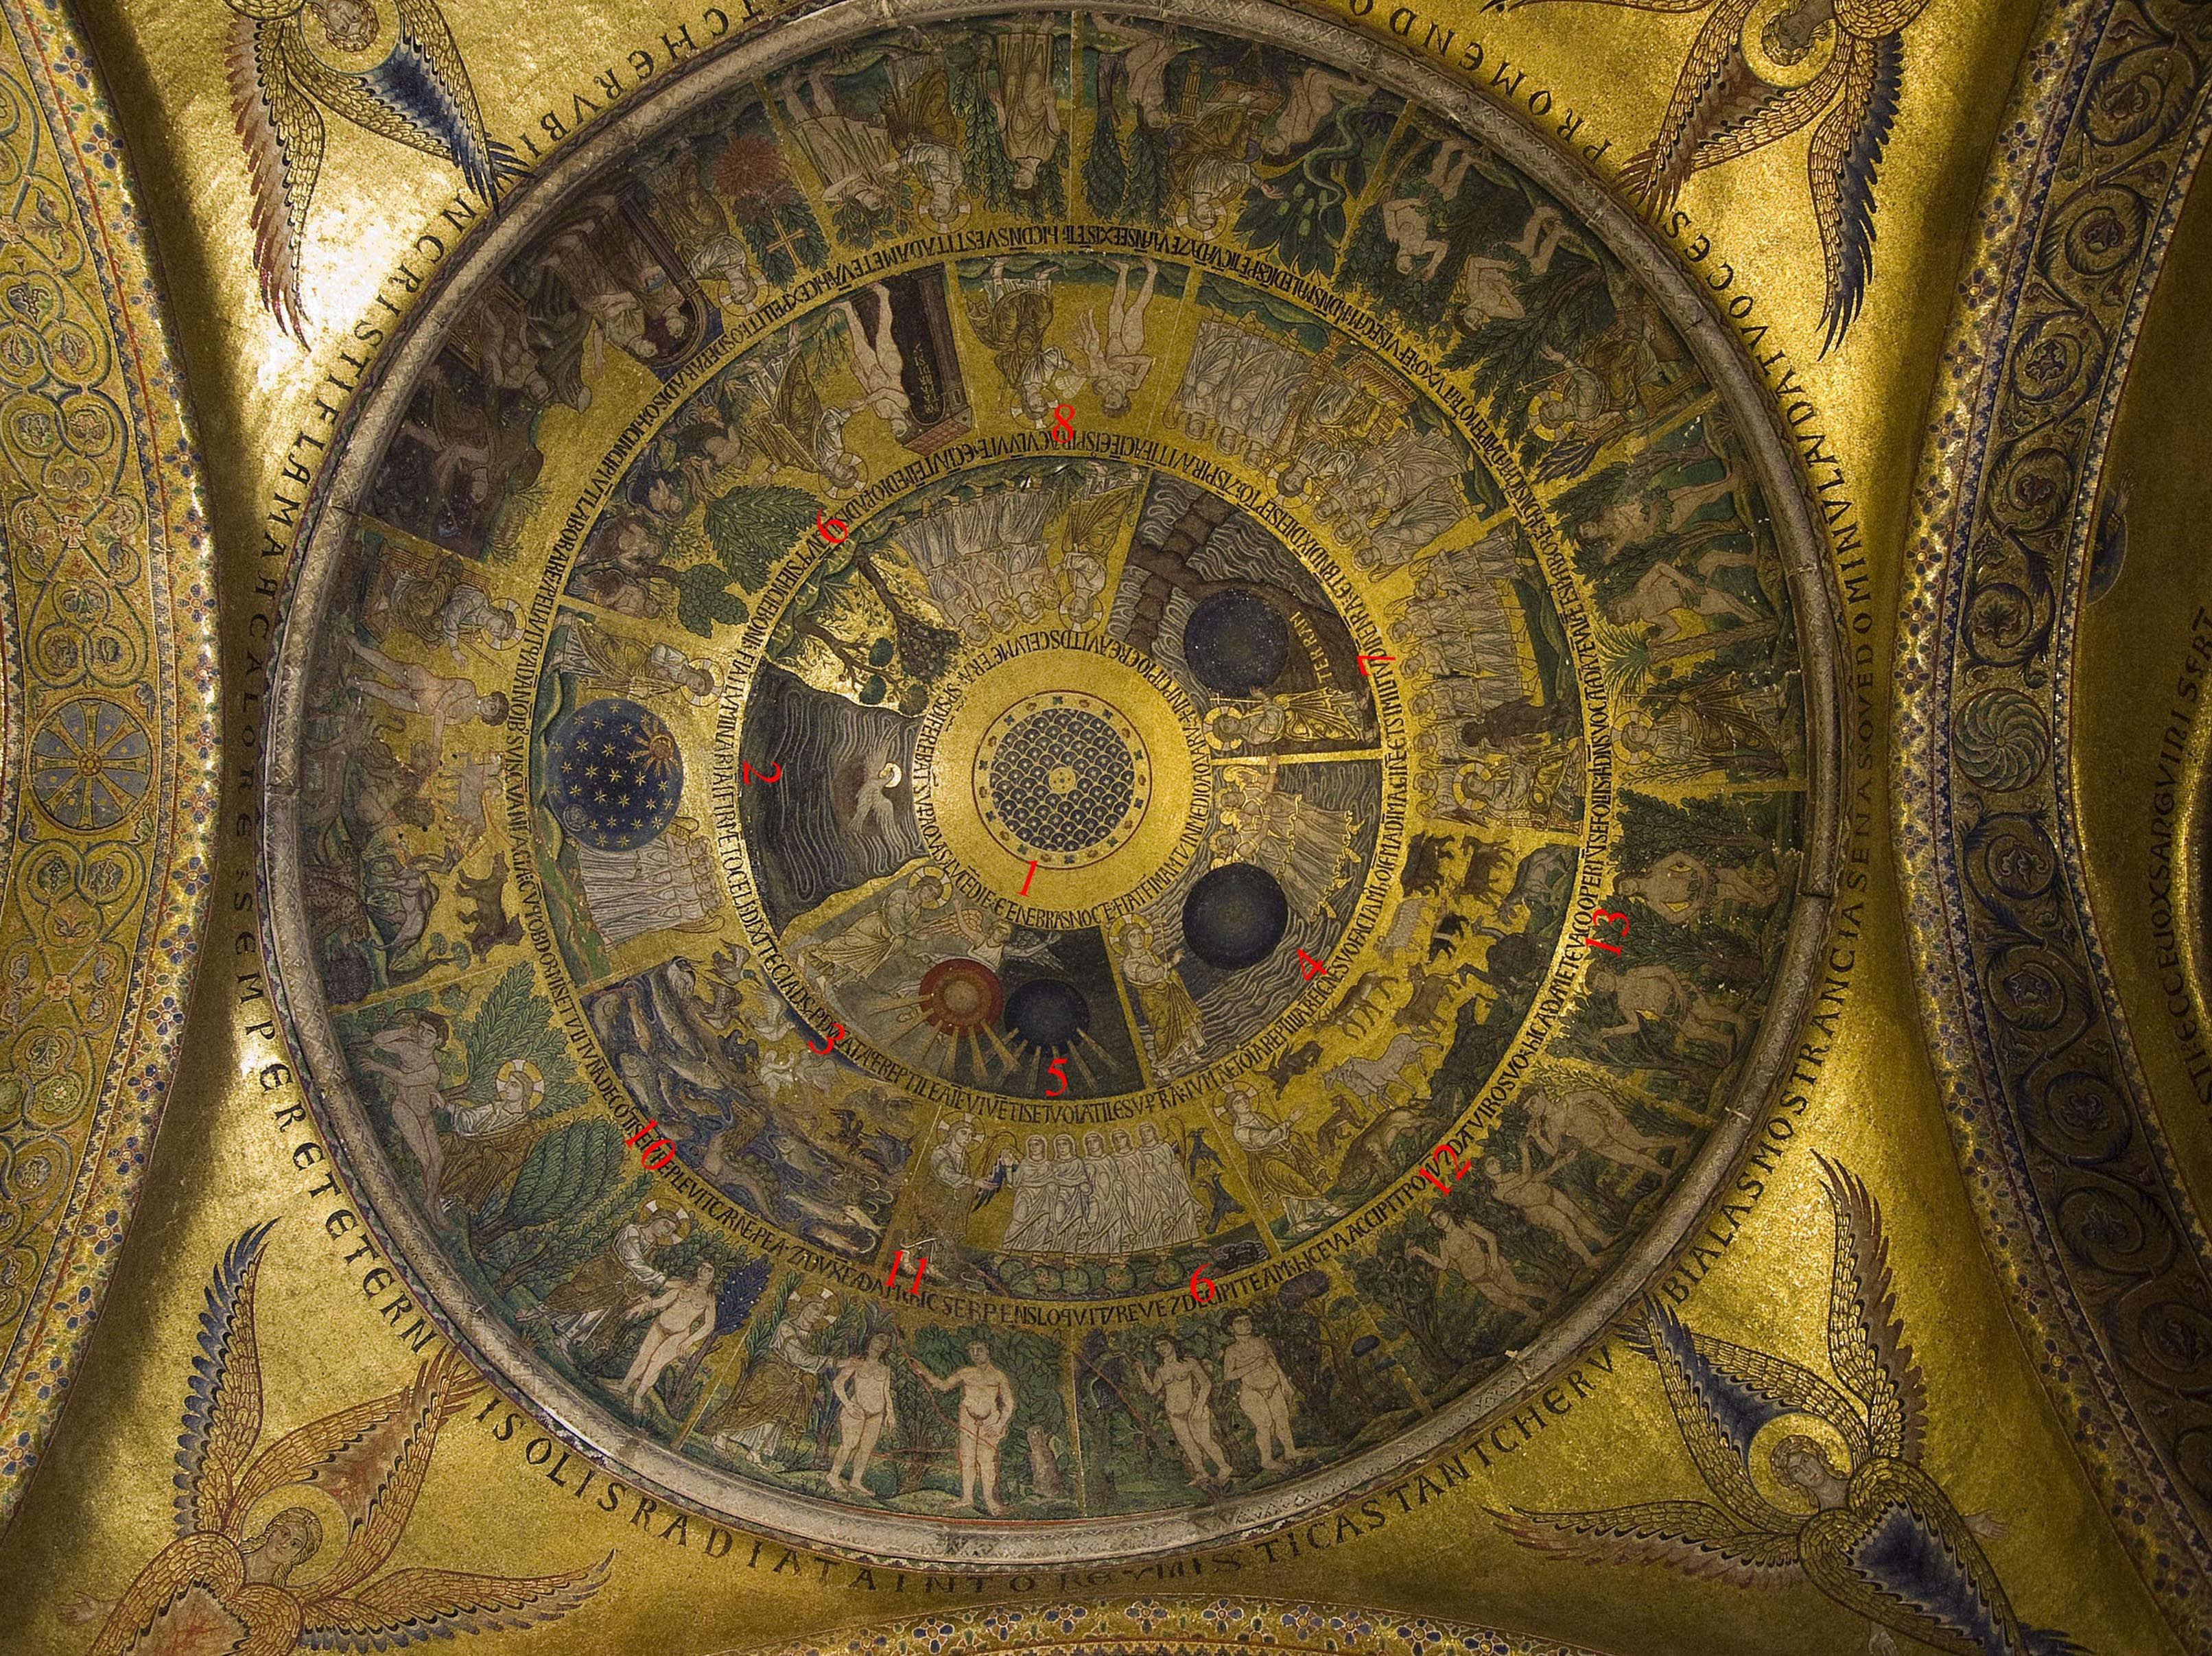 San Marco Amp Piazza Venice Italy Genesis Series Mosaics